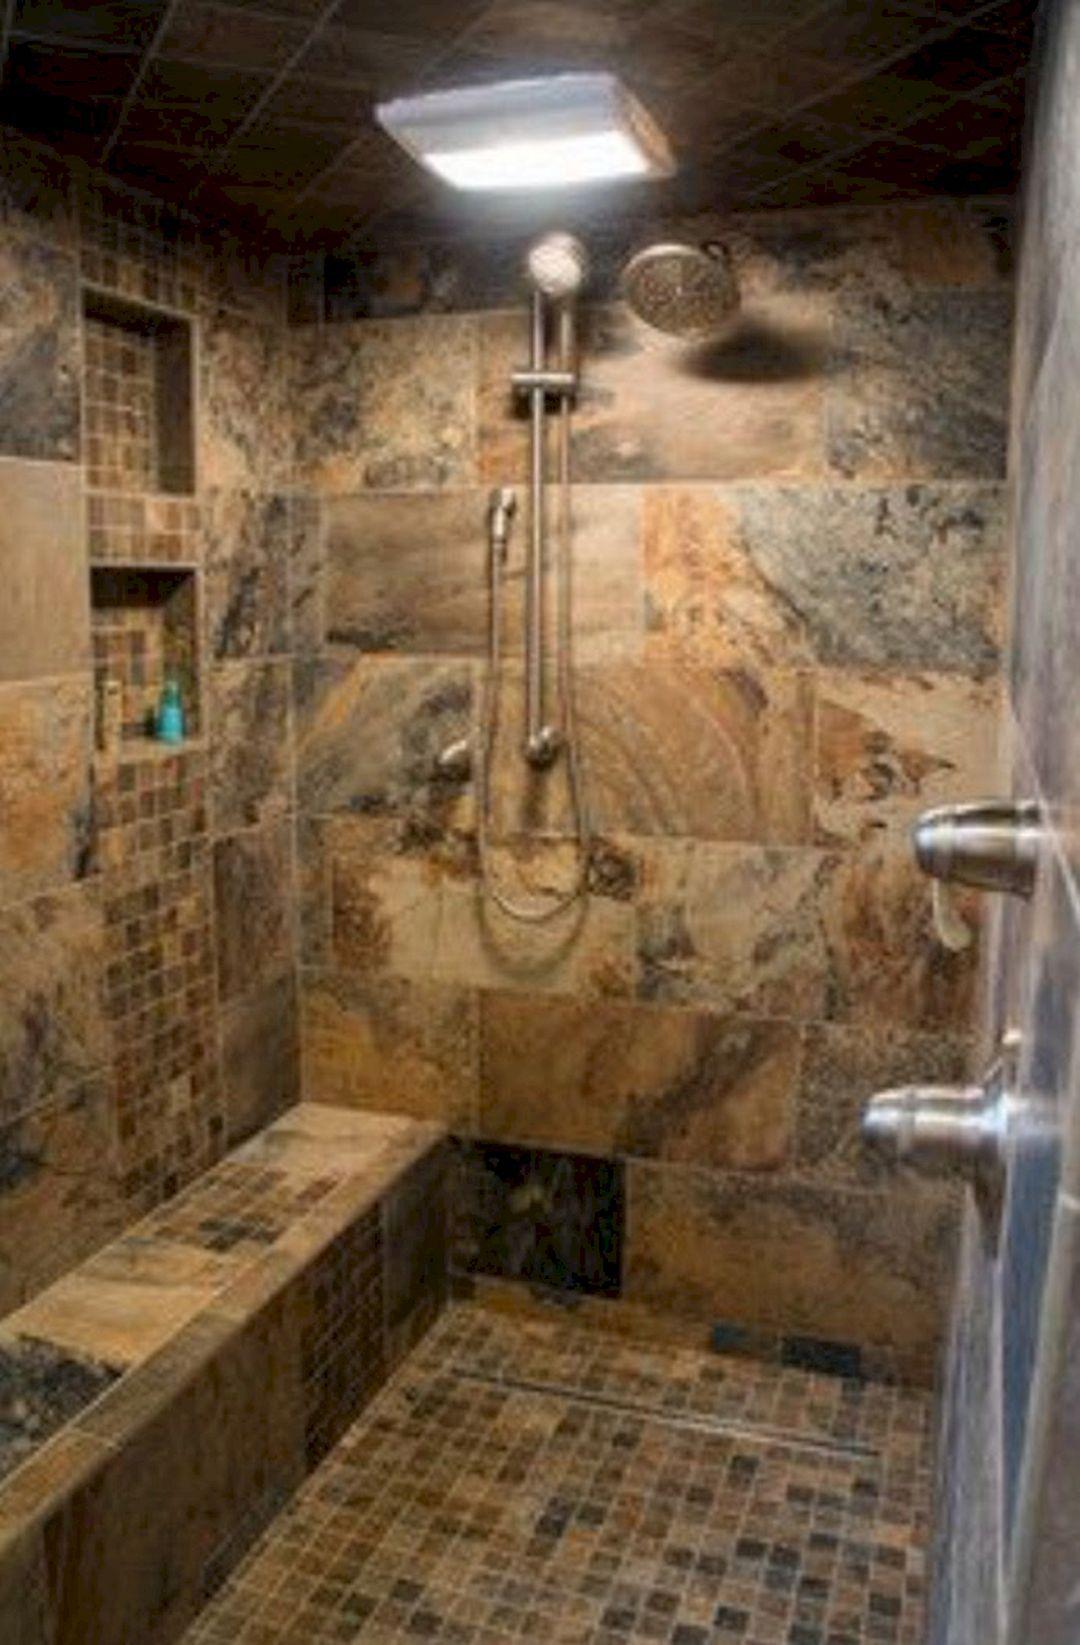 24 Top Doorless Shower Design for Small Bathroom Ideas